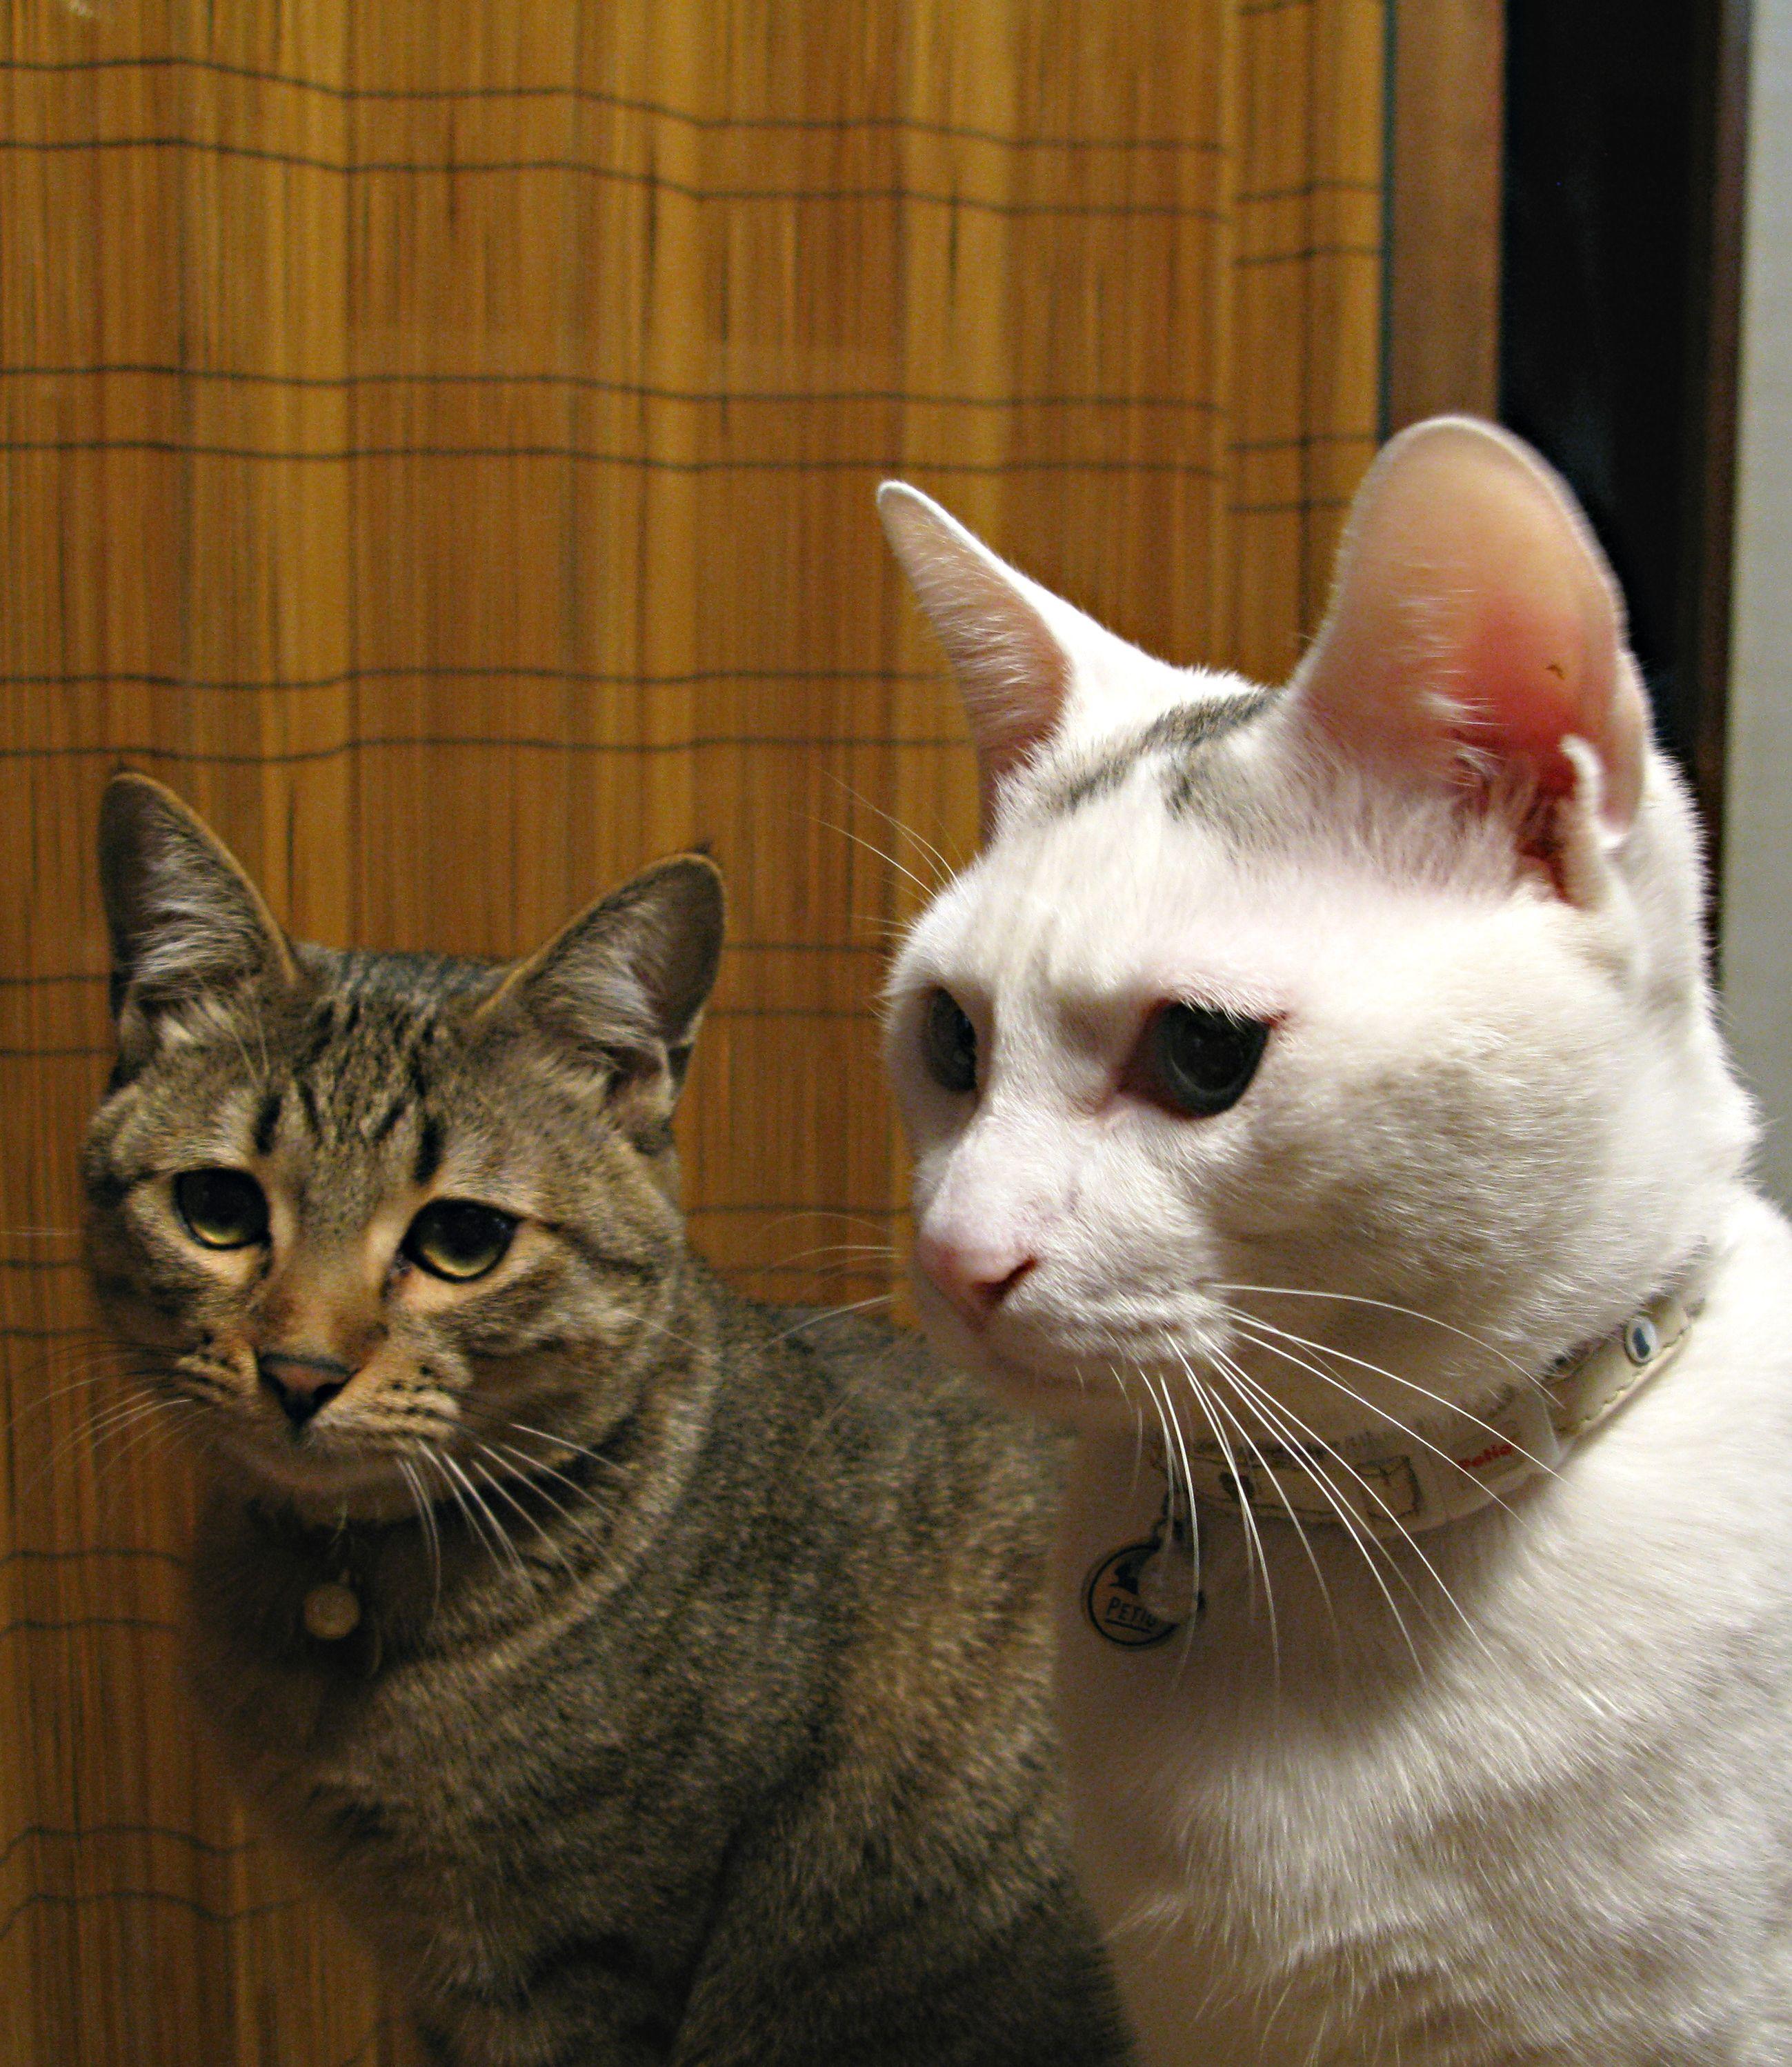 Puchi & Chiro Kitten meowing, Cats, Animals